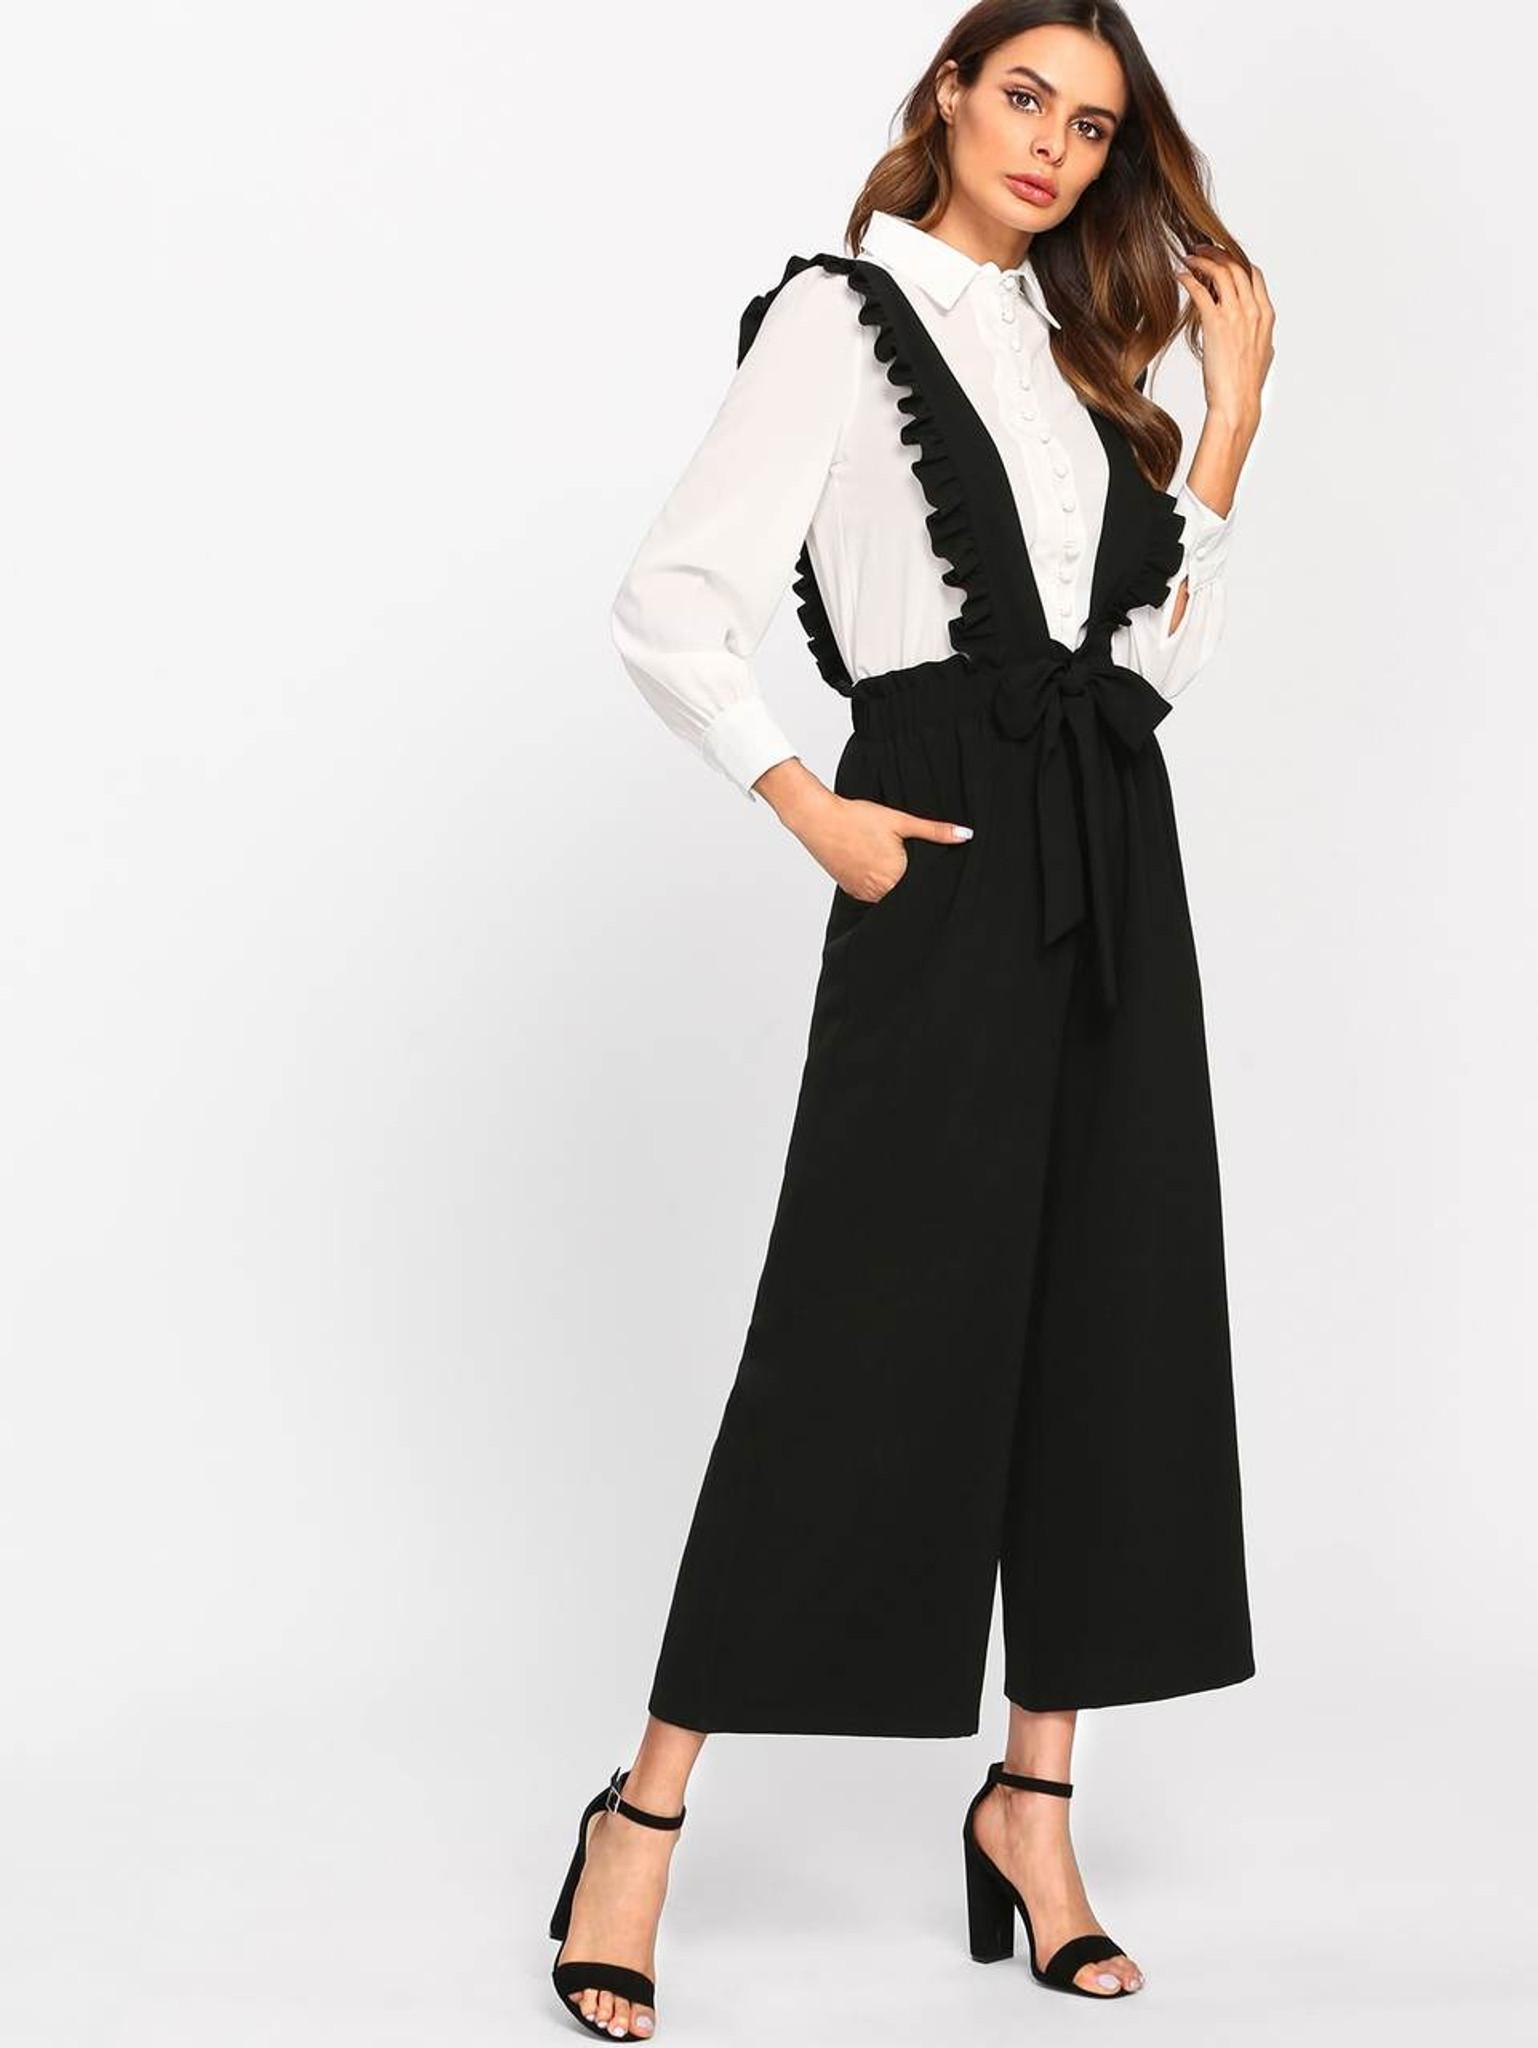 Fifth Avenue Women's AVNO4 Ruffle Suspender Pants - Black